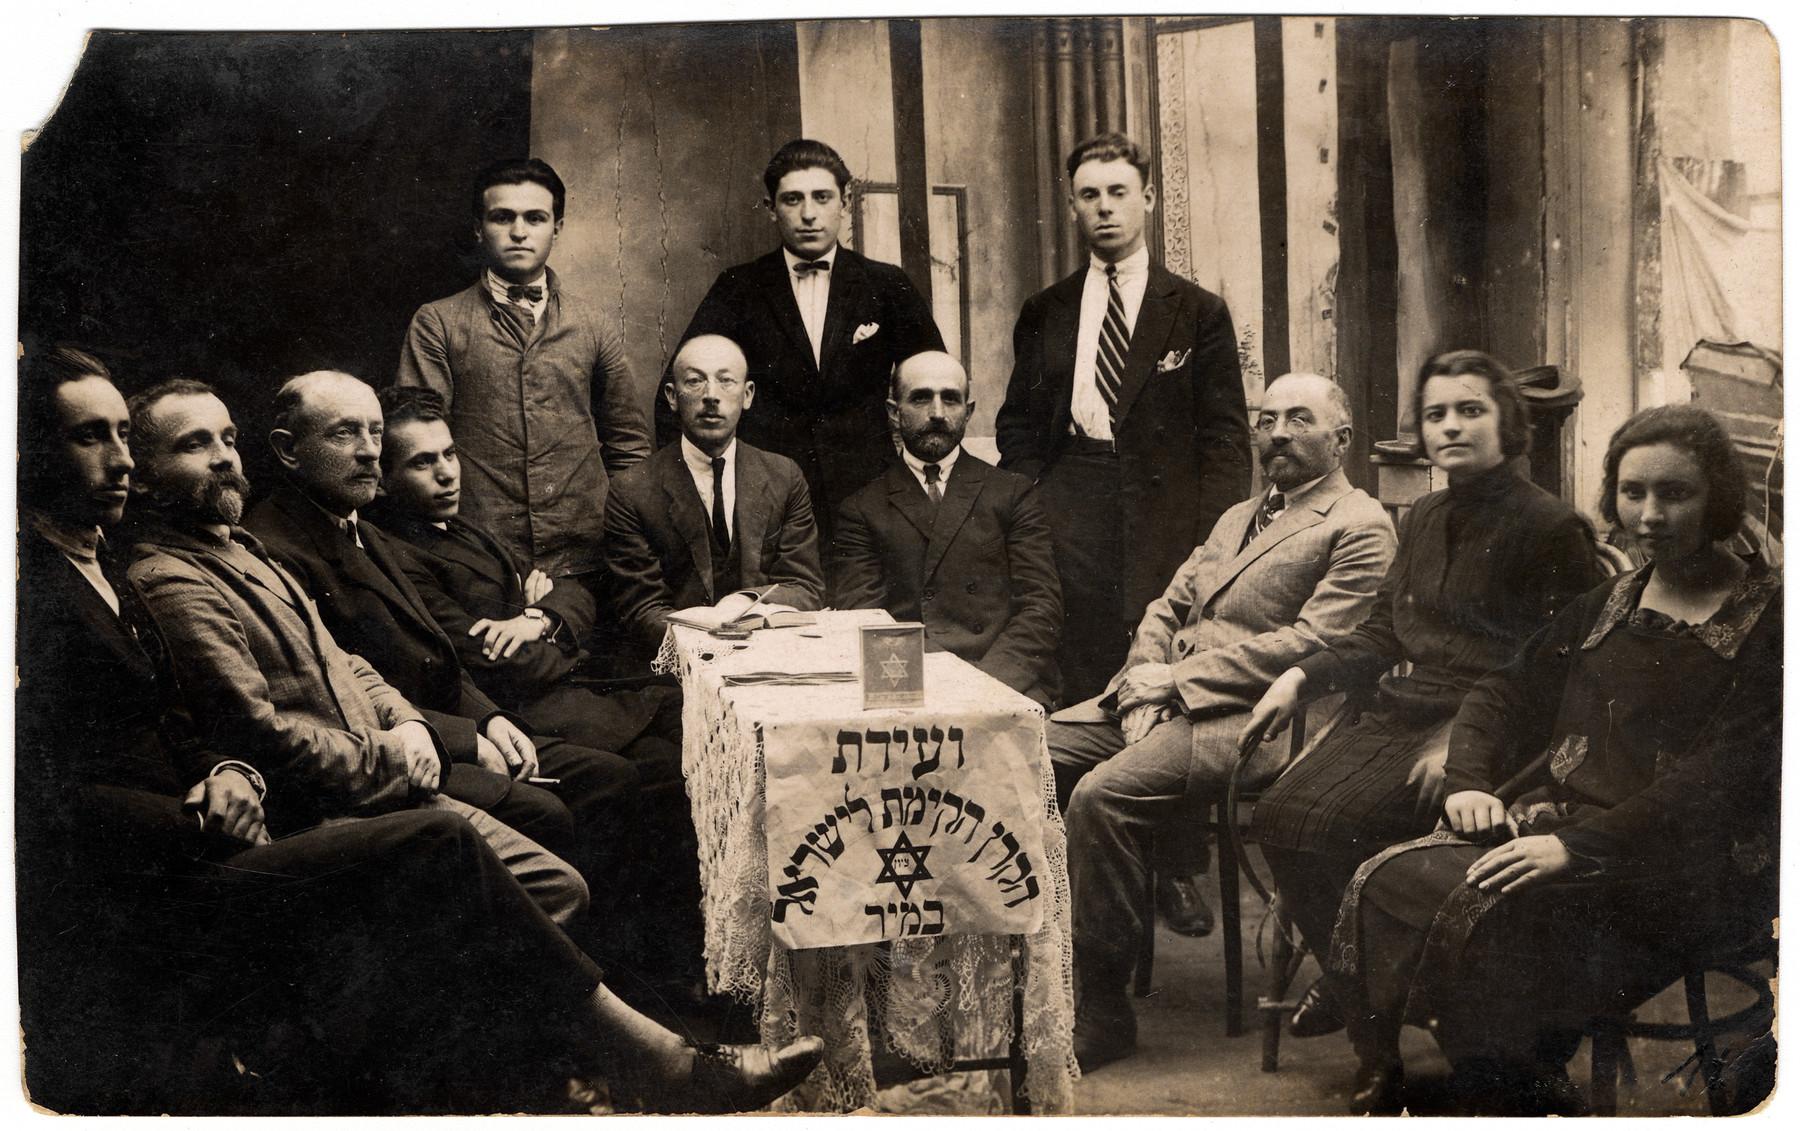 Members of the organizing committee of the Jewish National Fund (Keren Kayemet) in Mir.